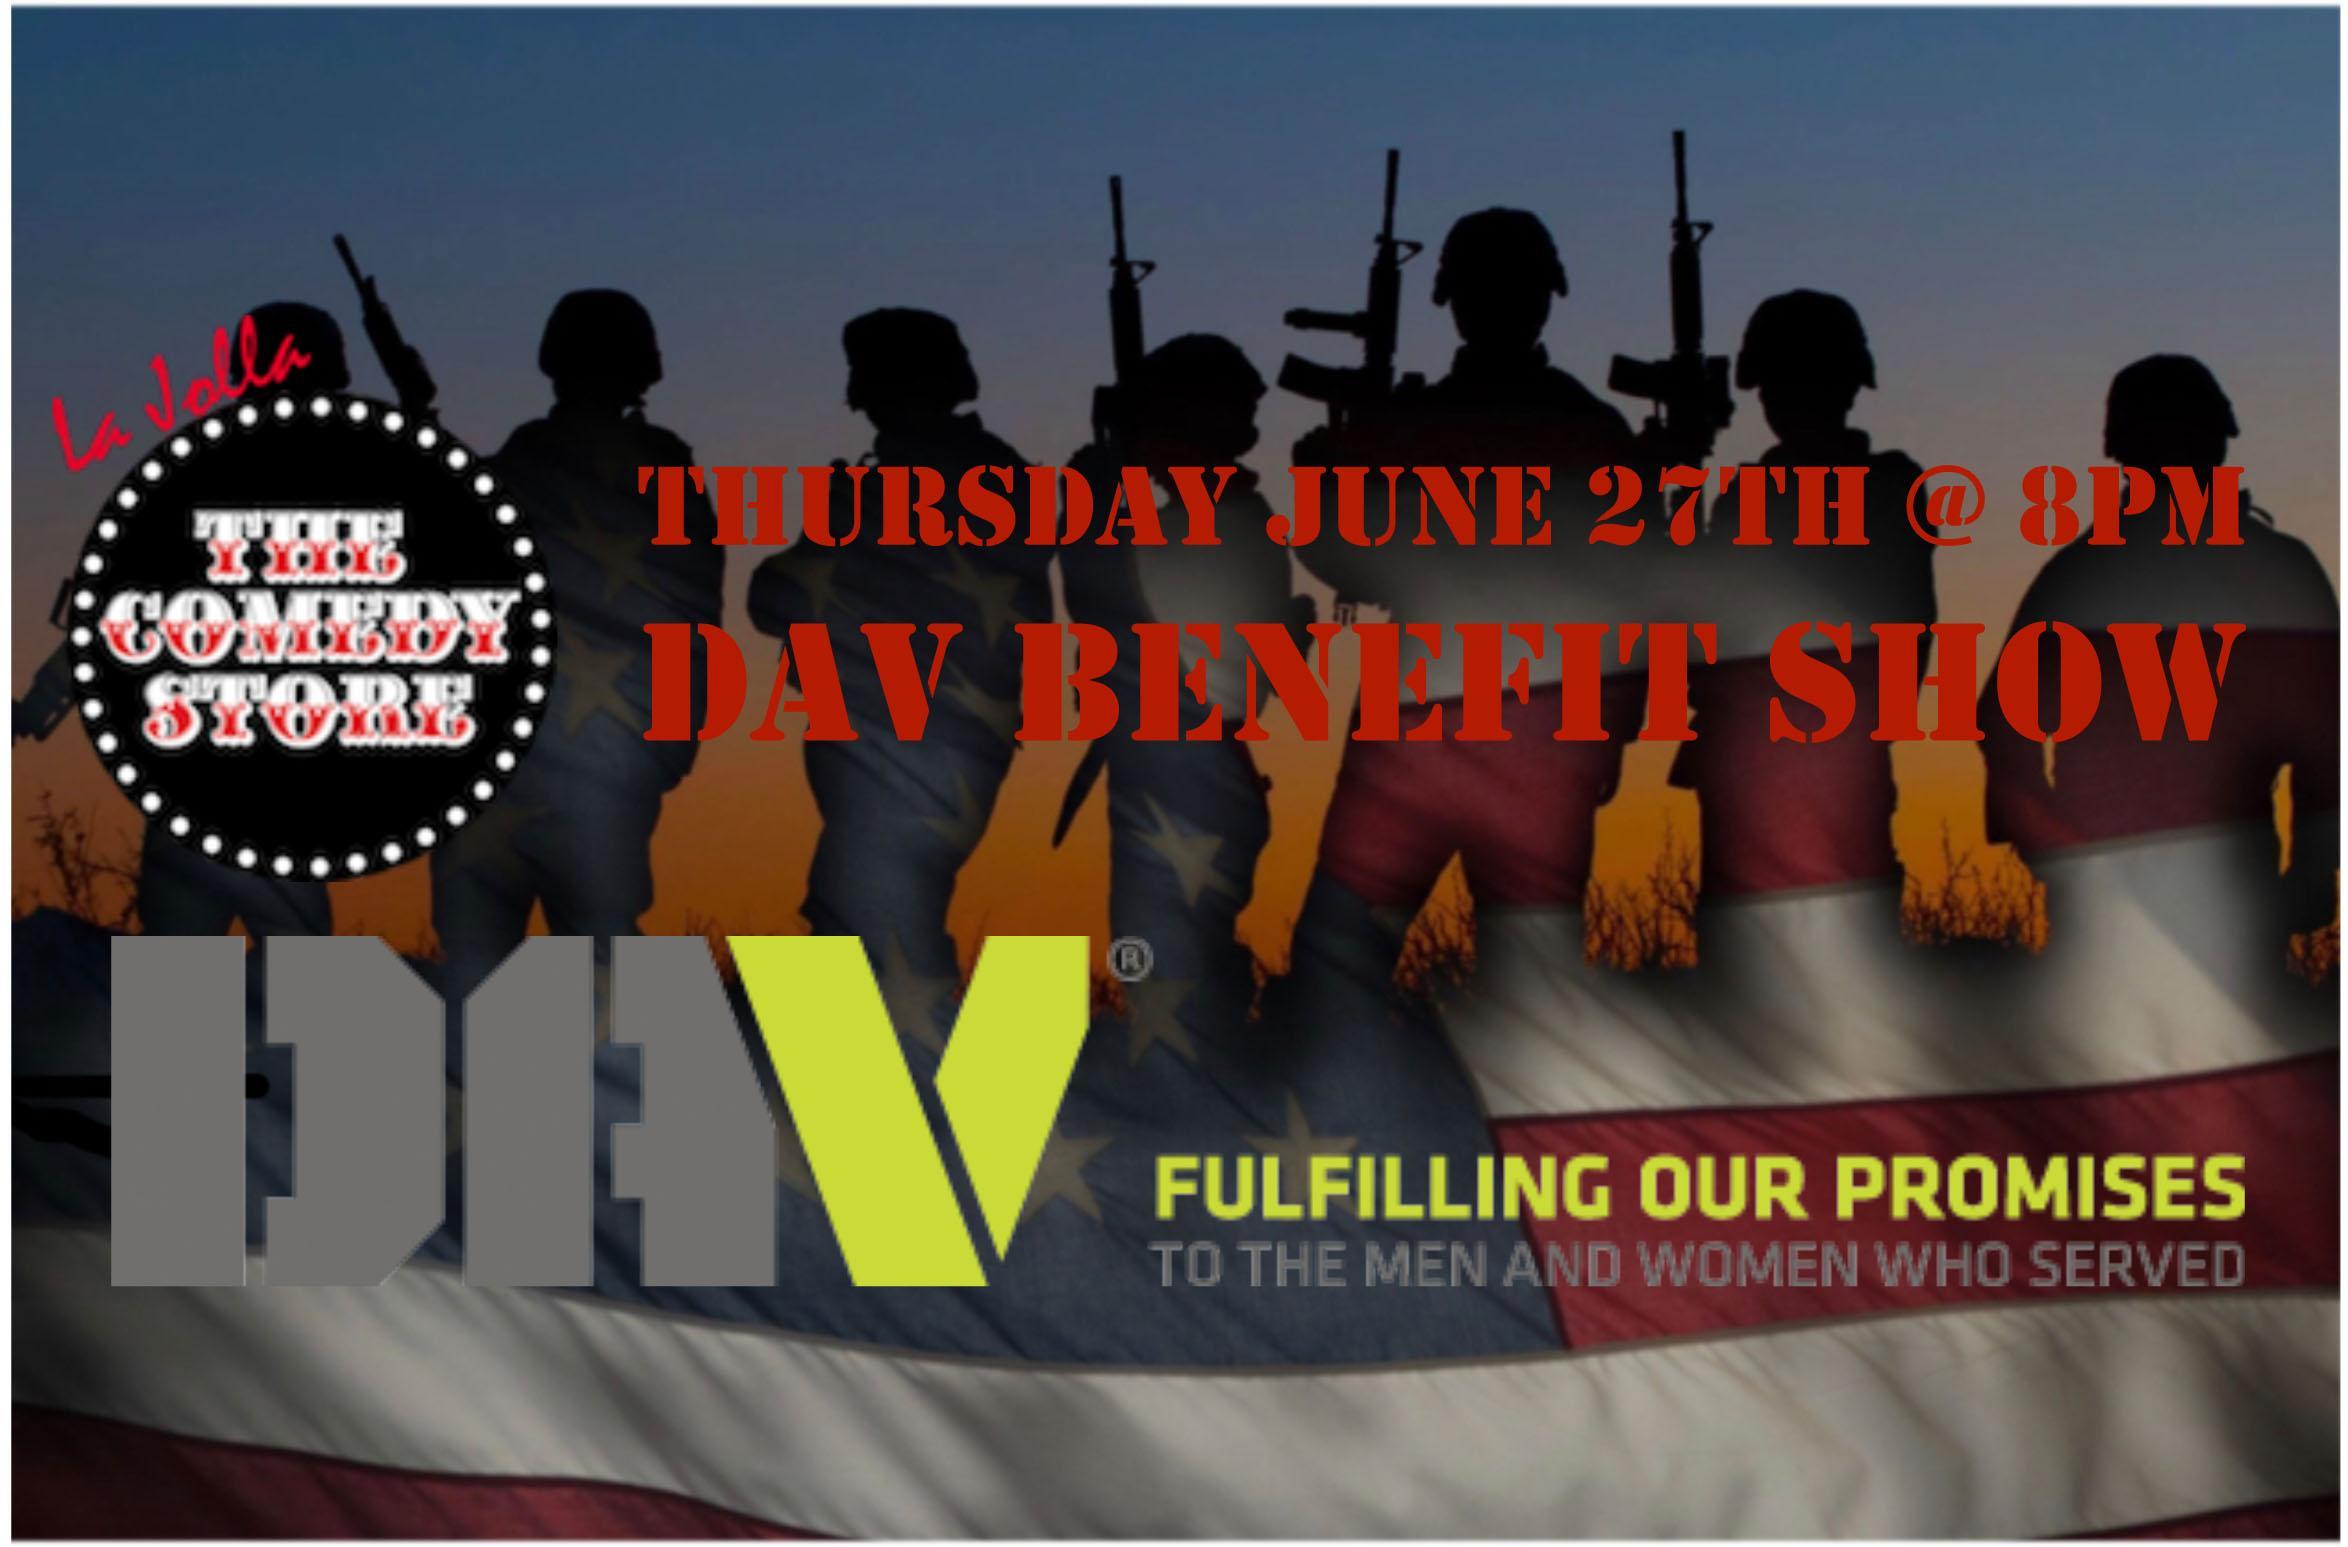 DAV Benefit Show- 8pm